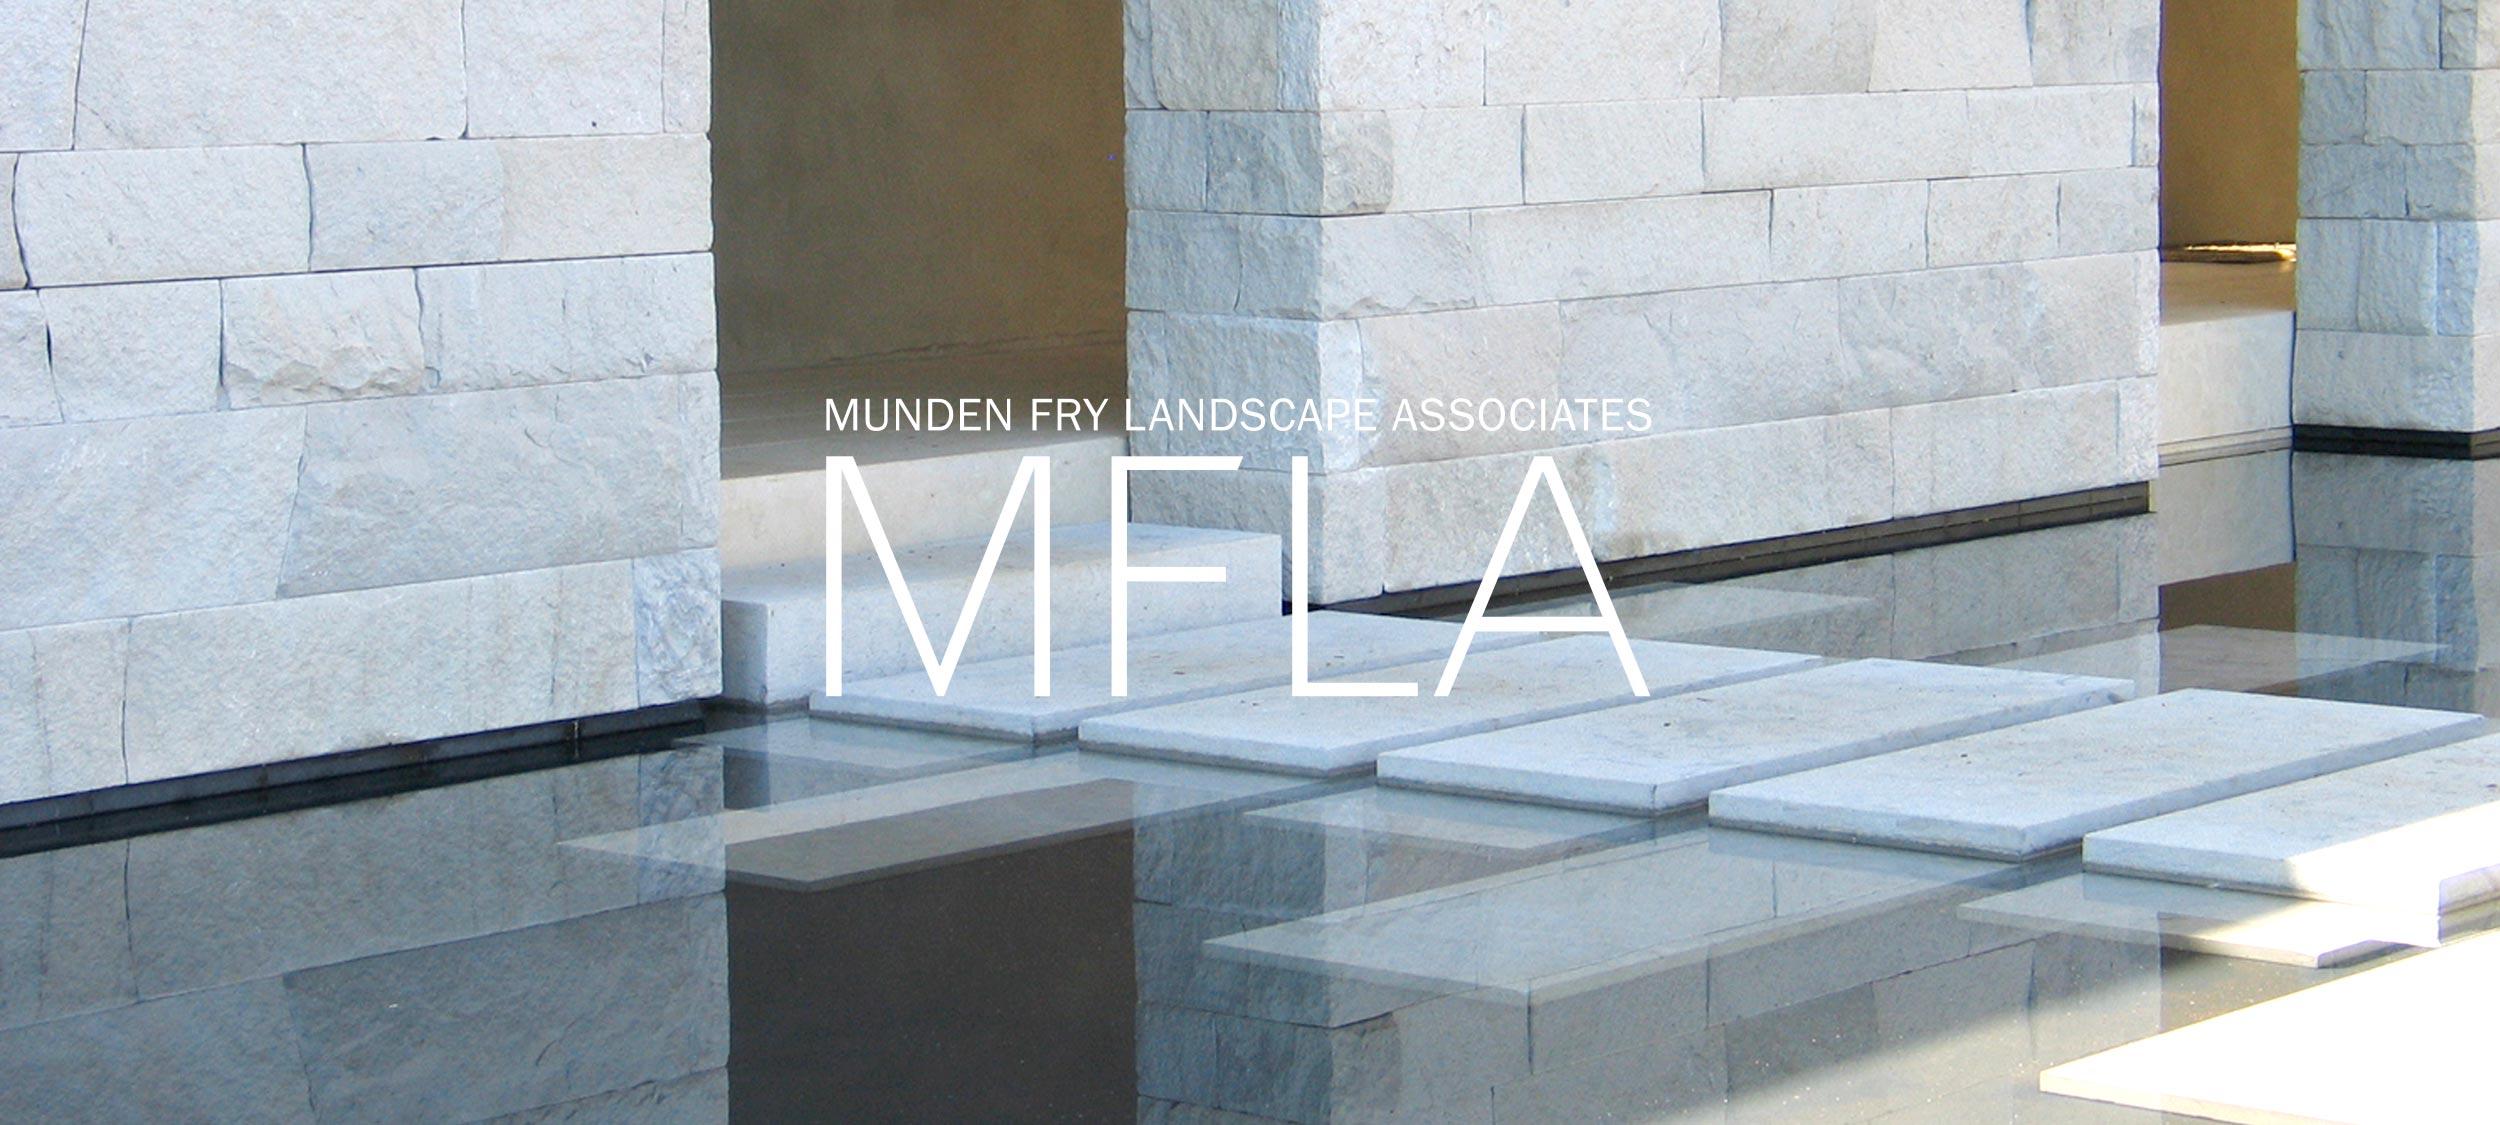 MFLA-Home-Gallery-14.jpg